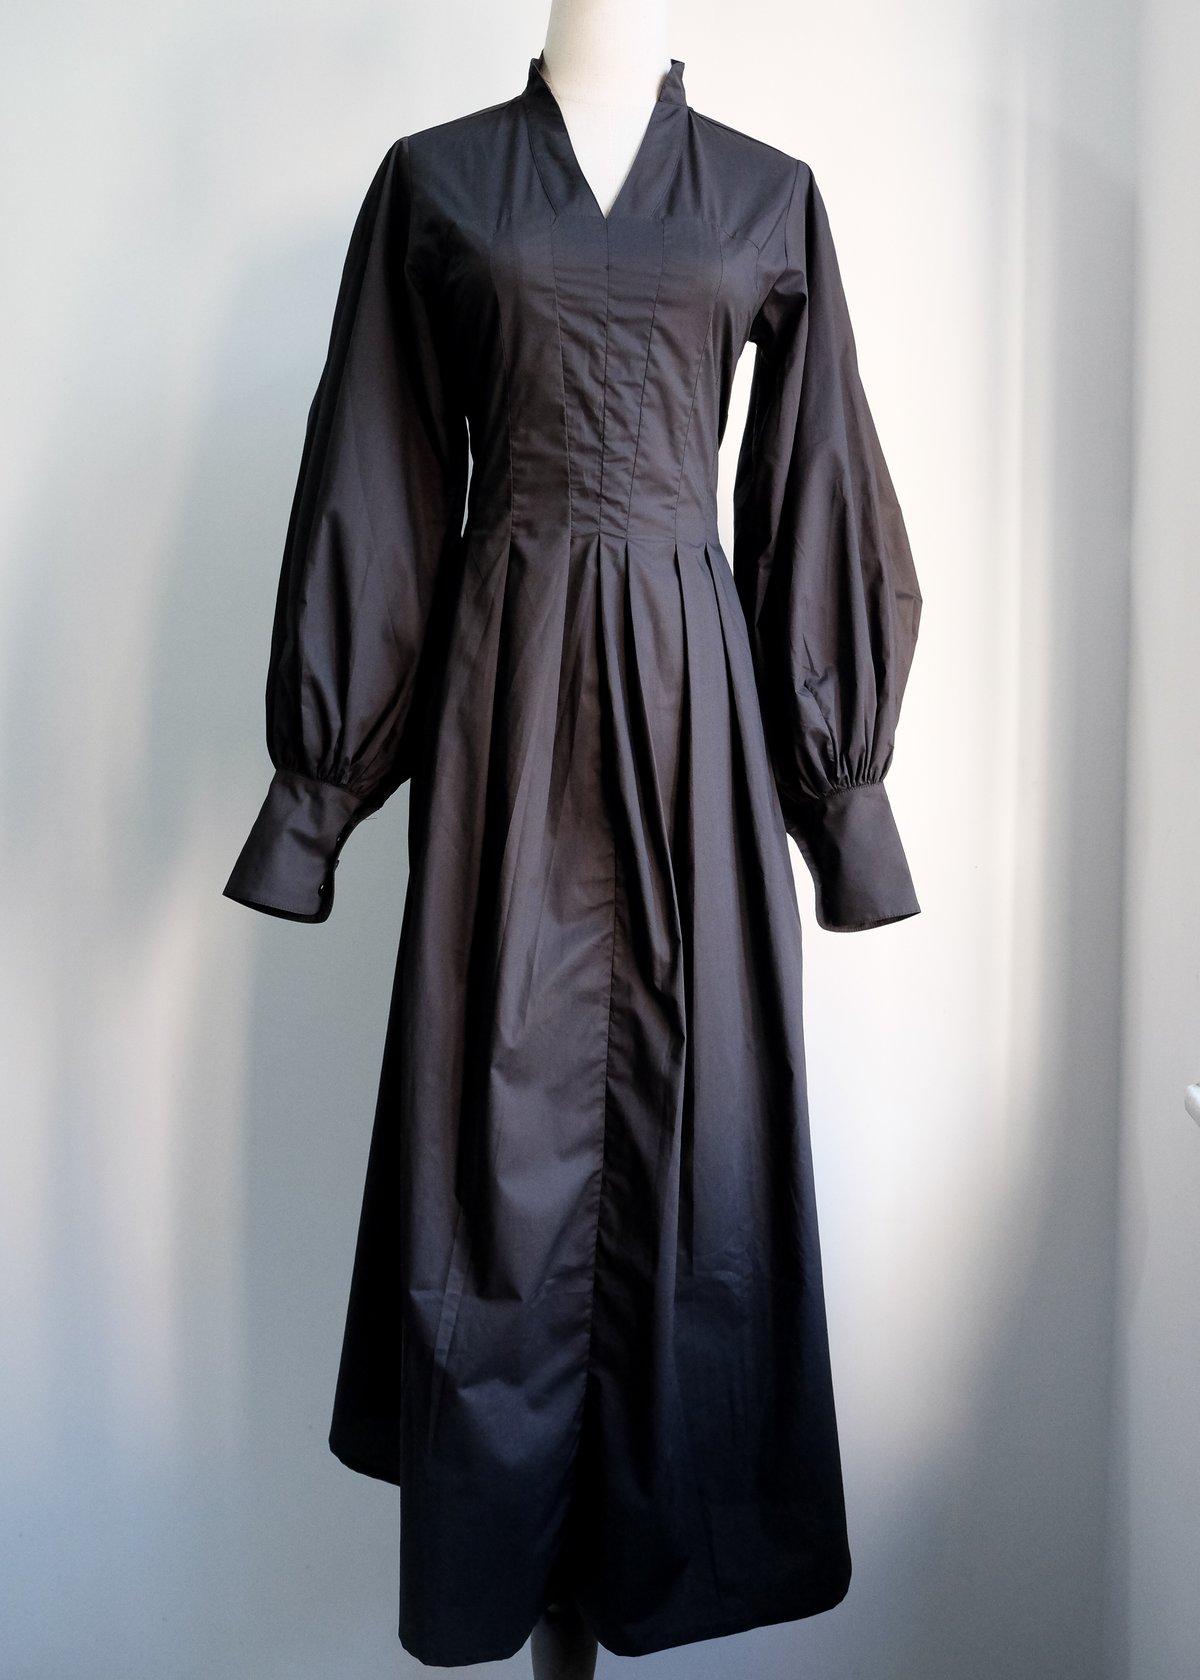 Image of  SAMPLE SALE - Unreleased Dress 27